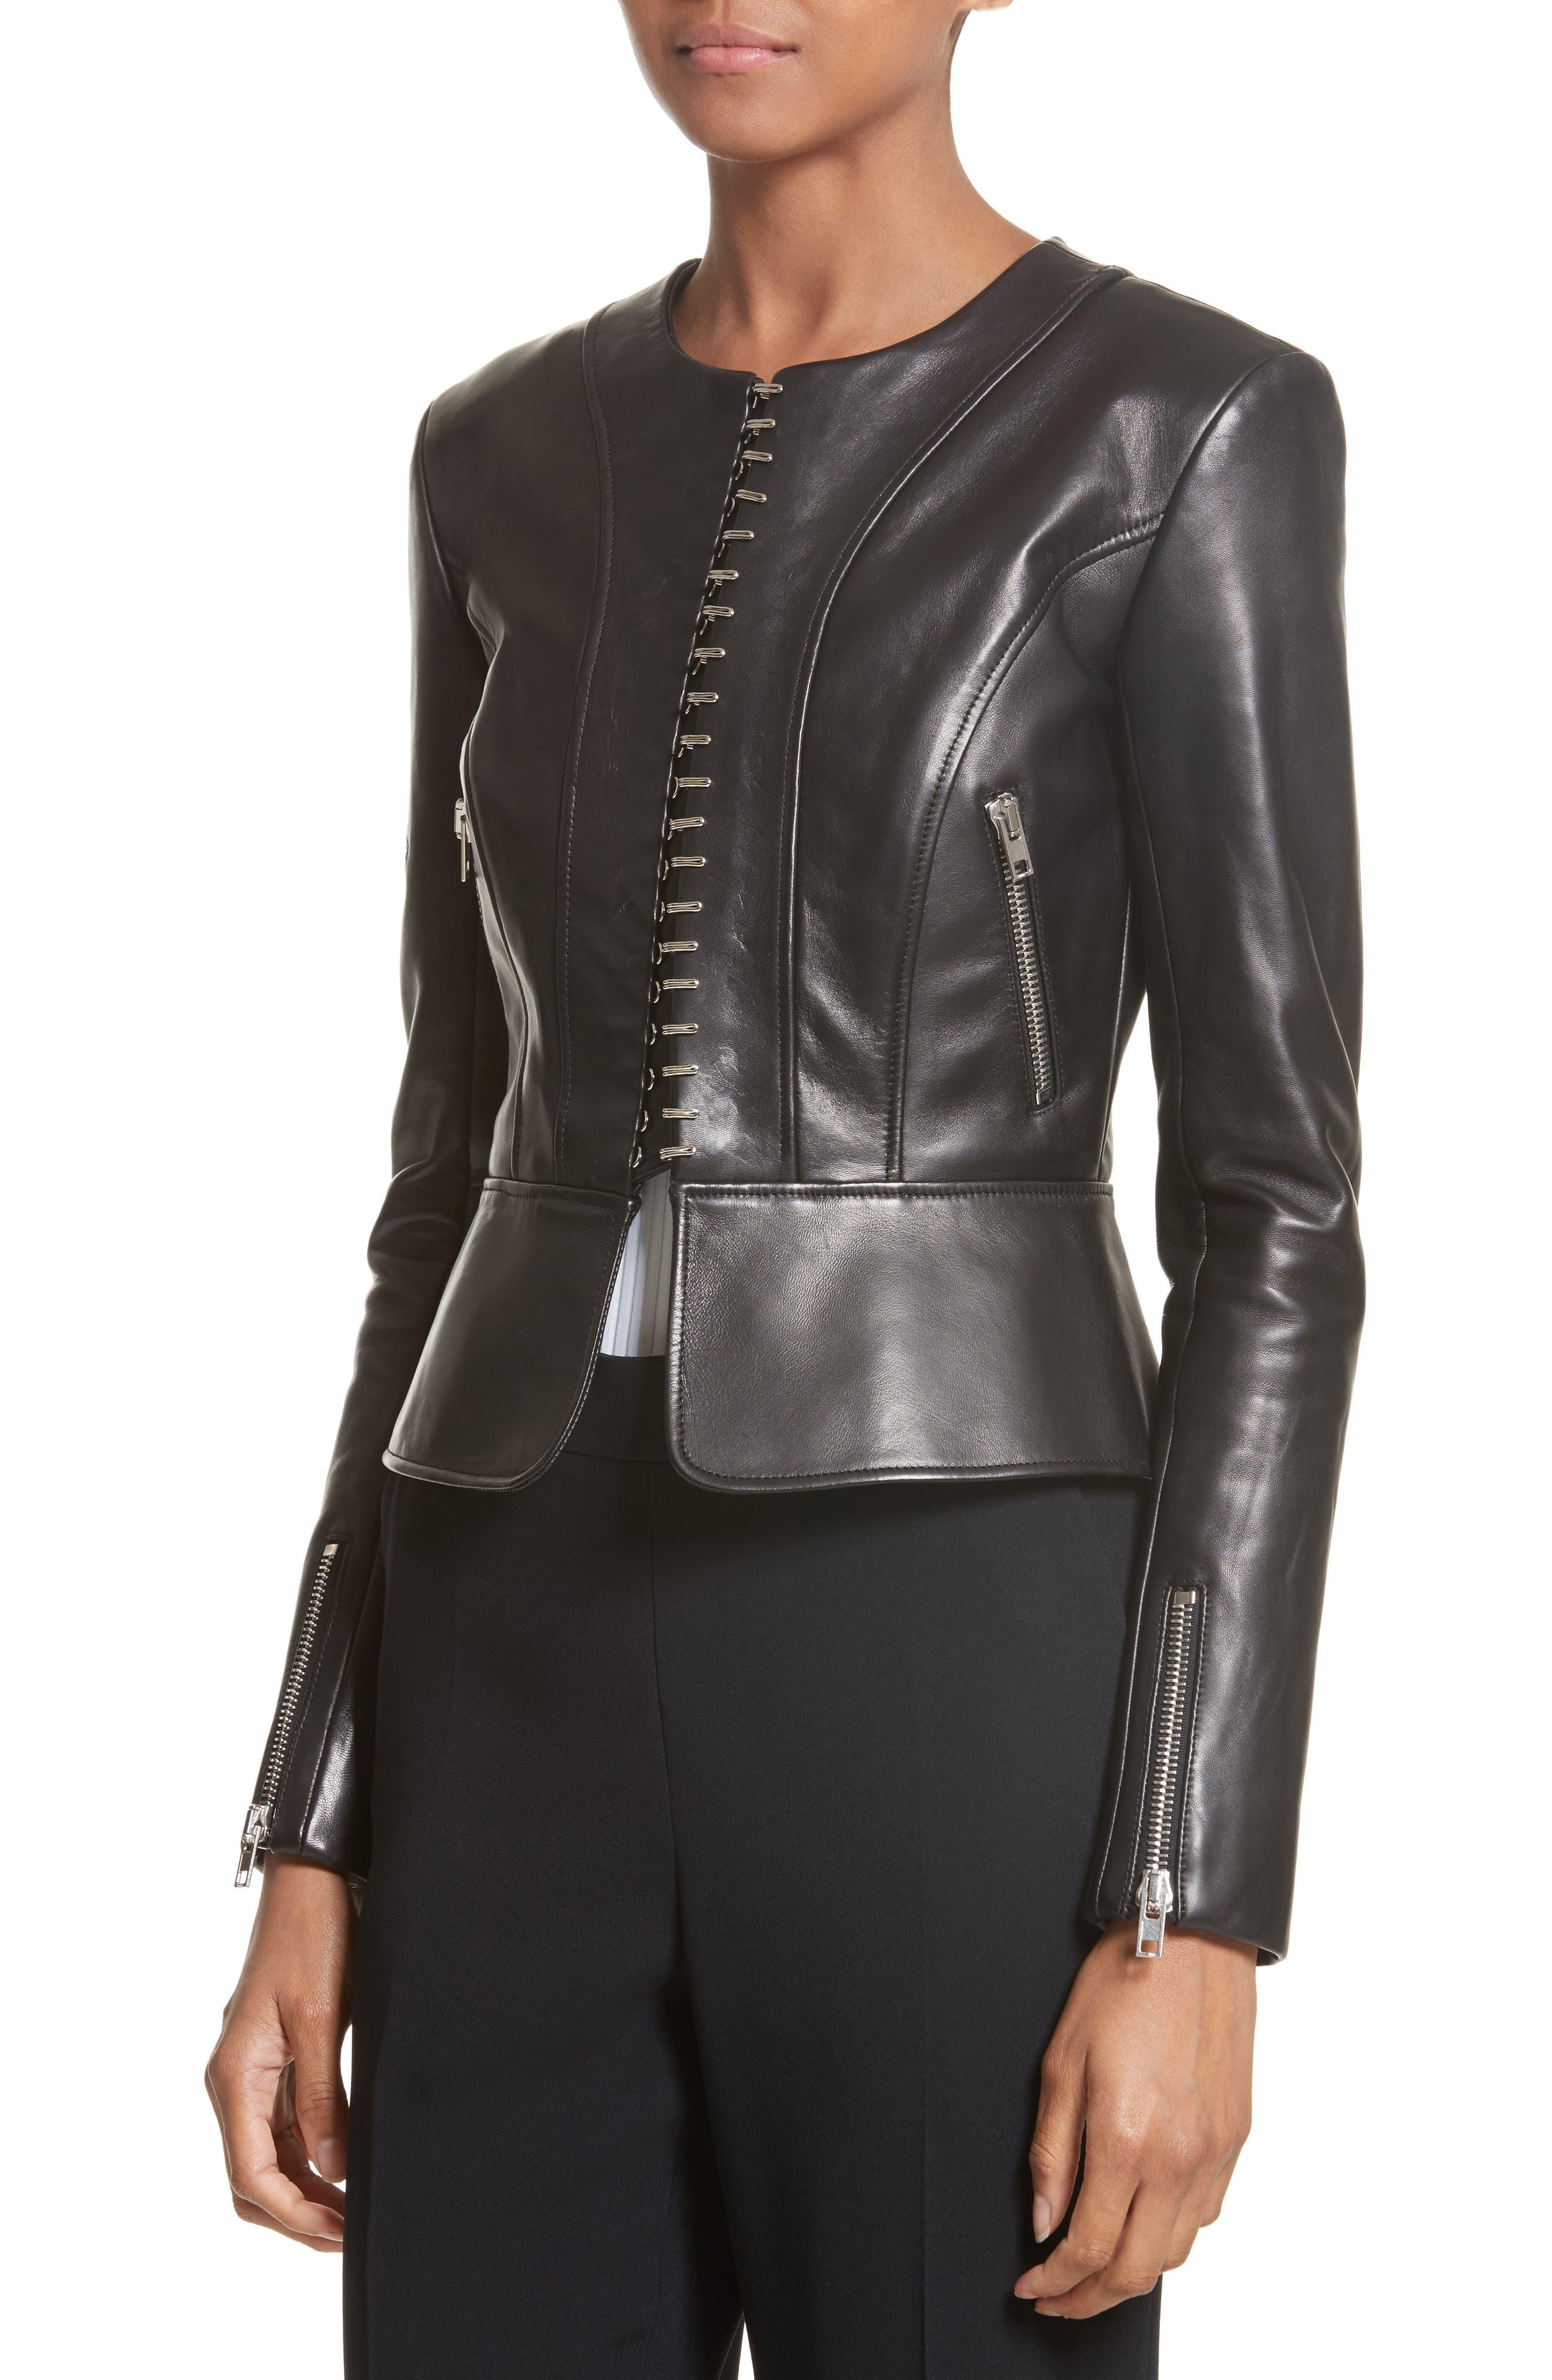 Hook Detail Lambskin Leather Jacket,                             Alternate thumbnail 4, color,                             Black